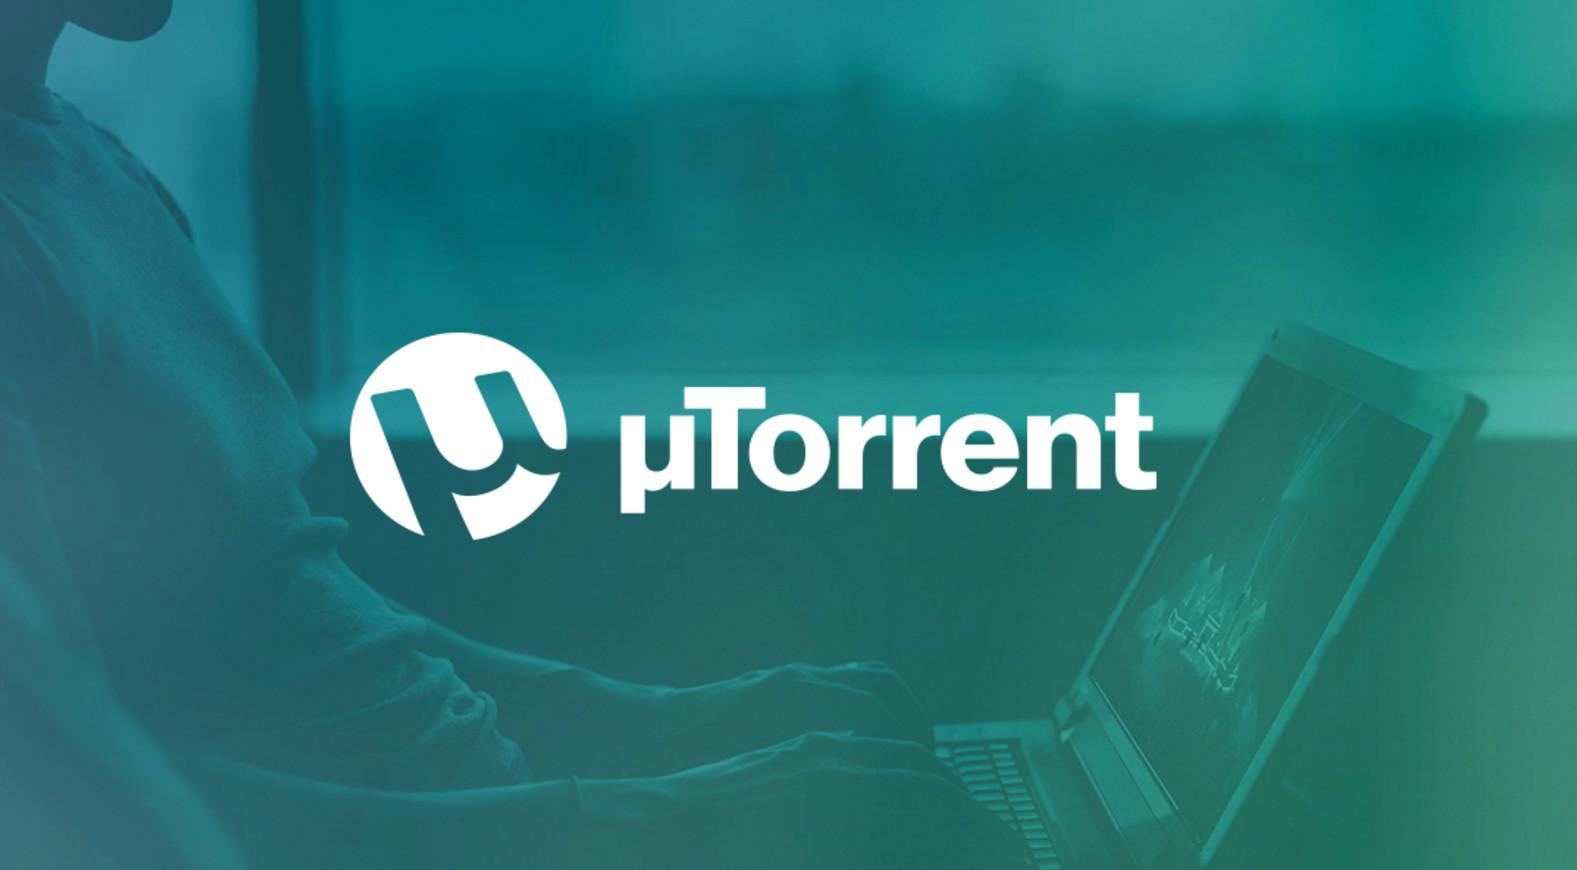 Como descargar música con uTorrent